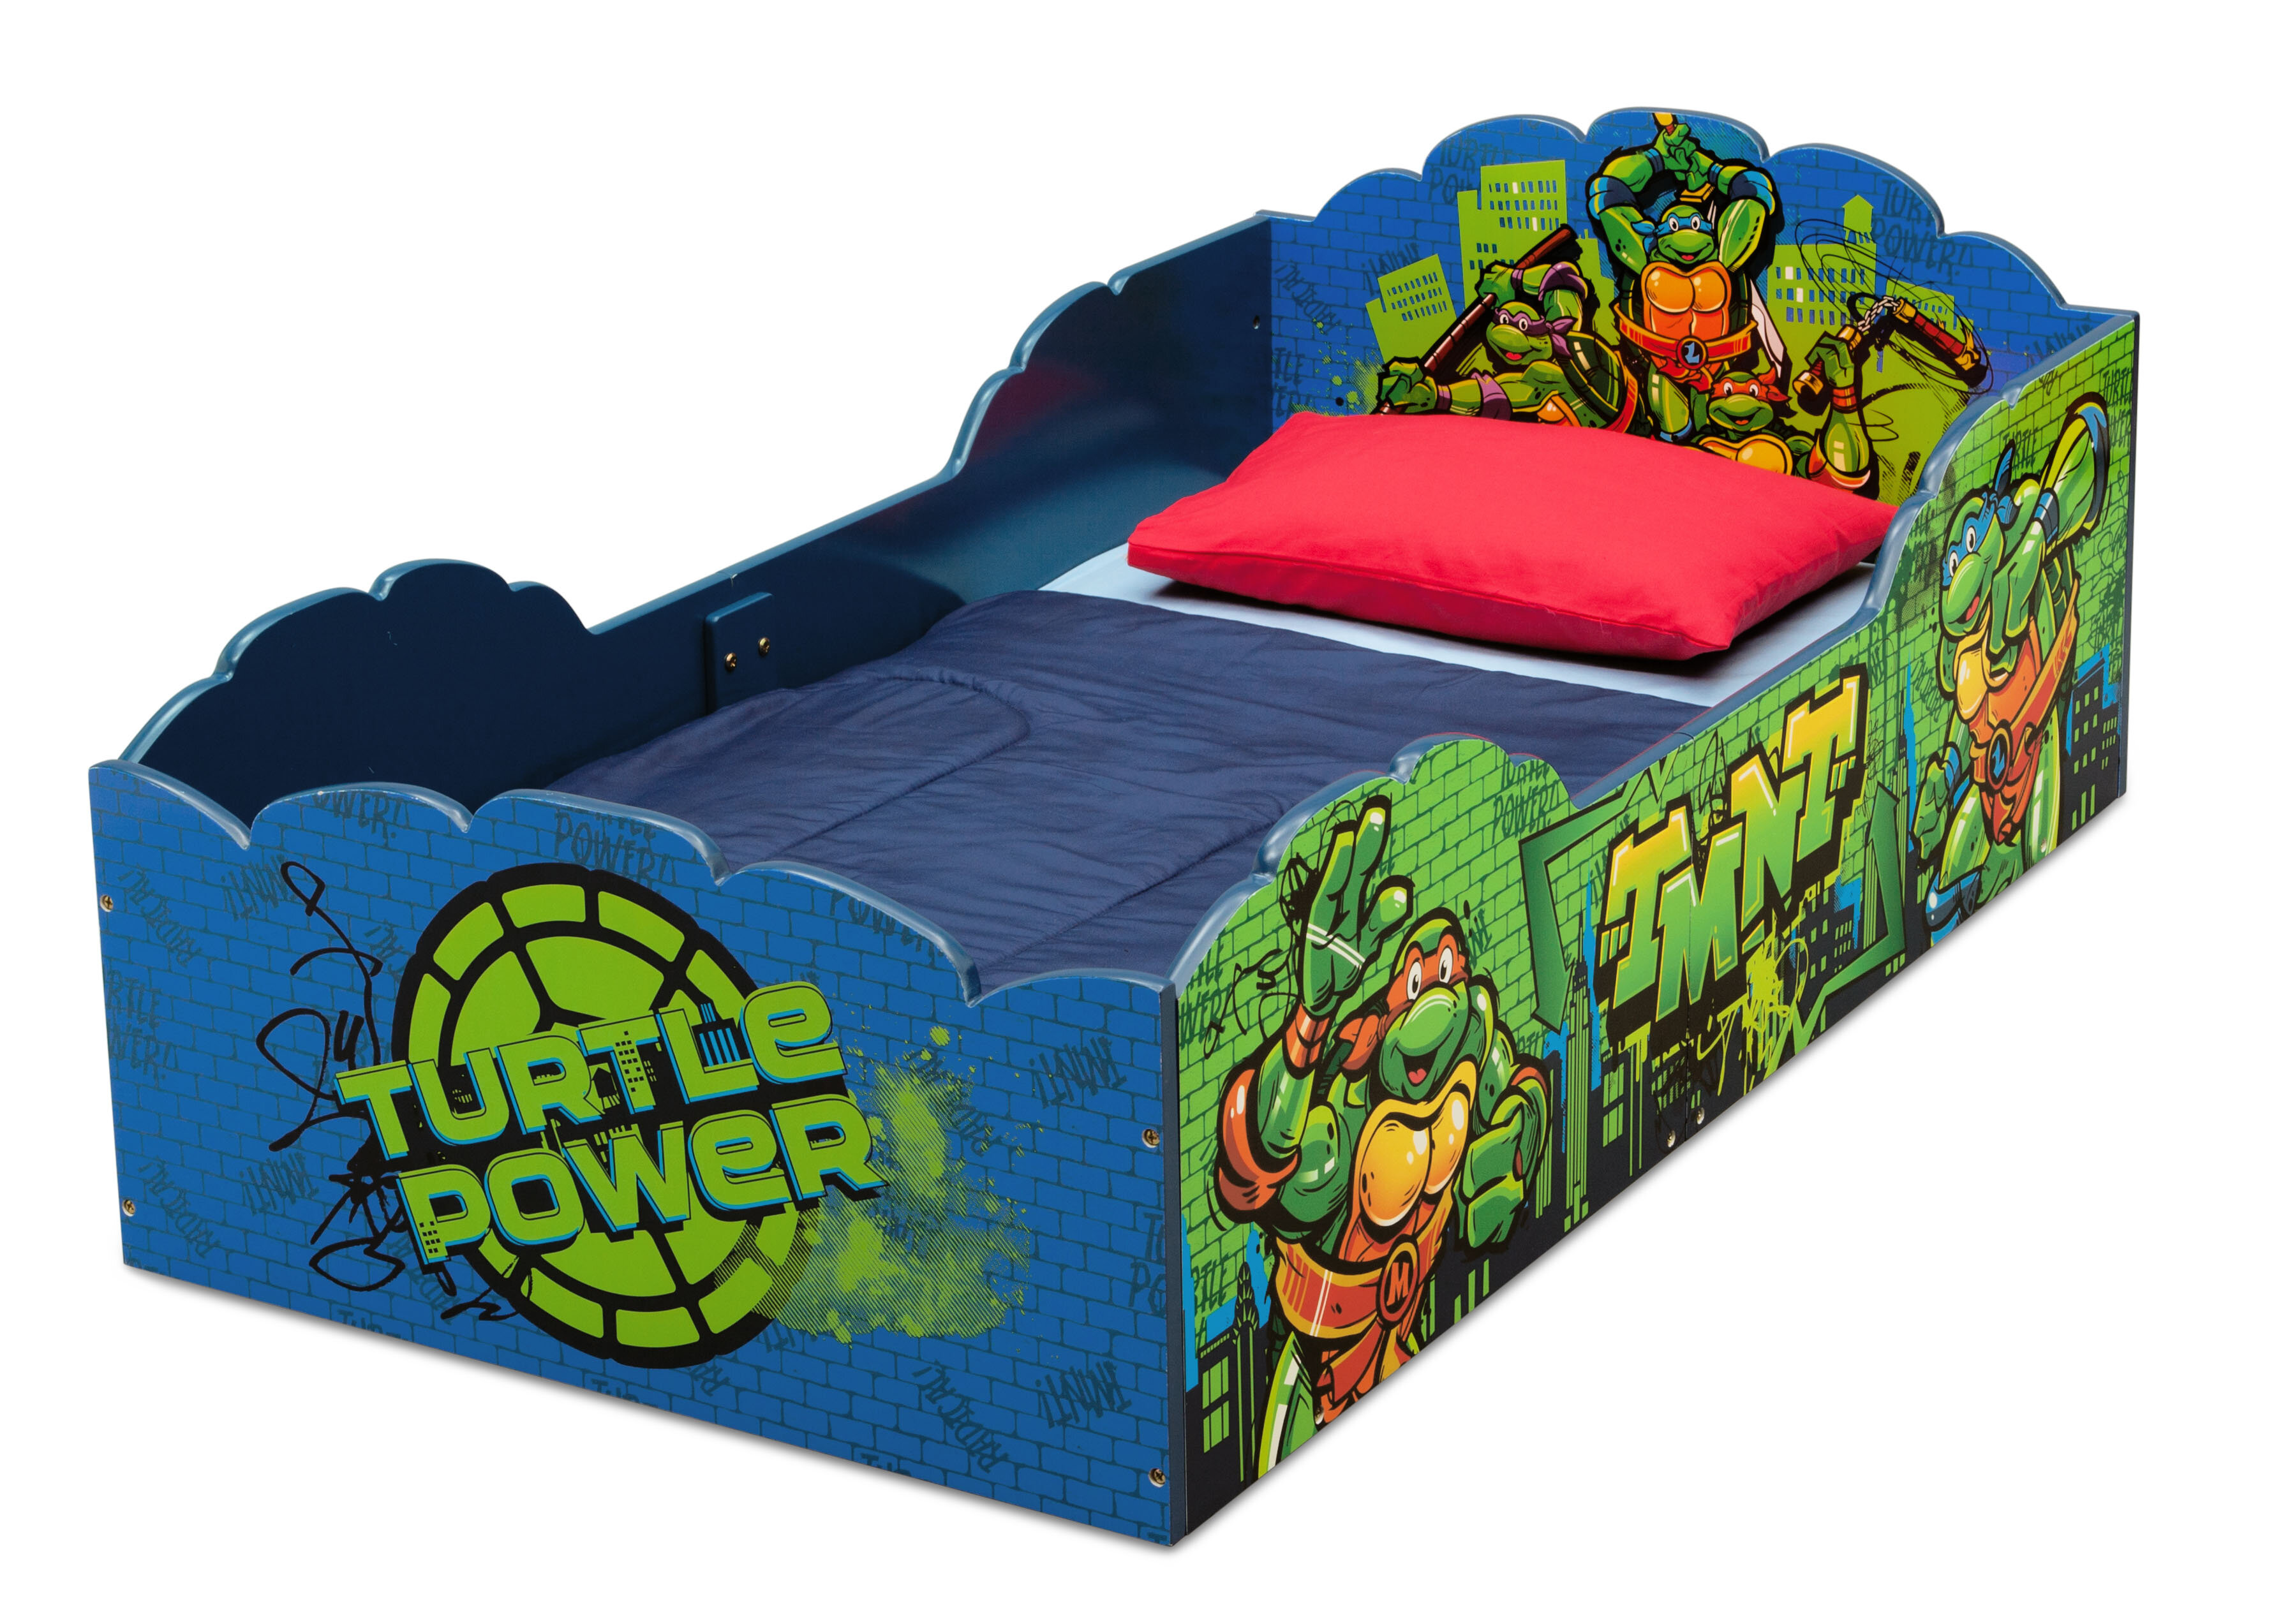 Delta Children Age Mutant Ninja Turtles Convertible Toddler Bed Reviews Wayfair